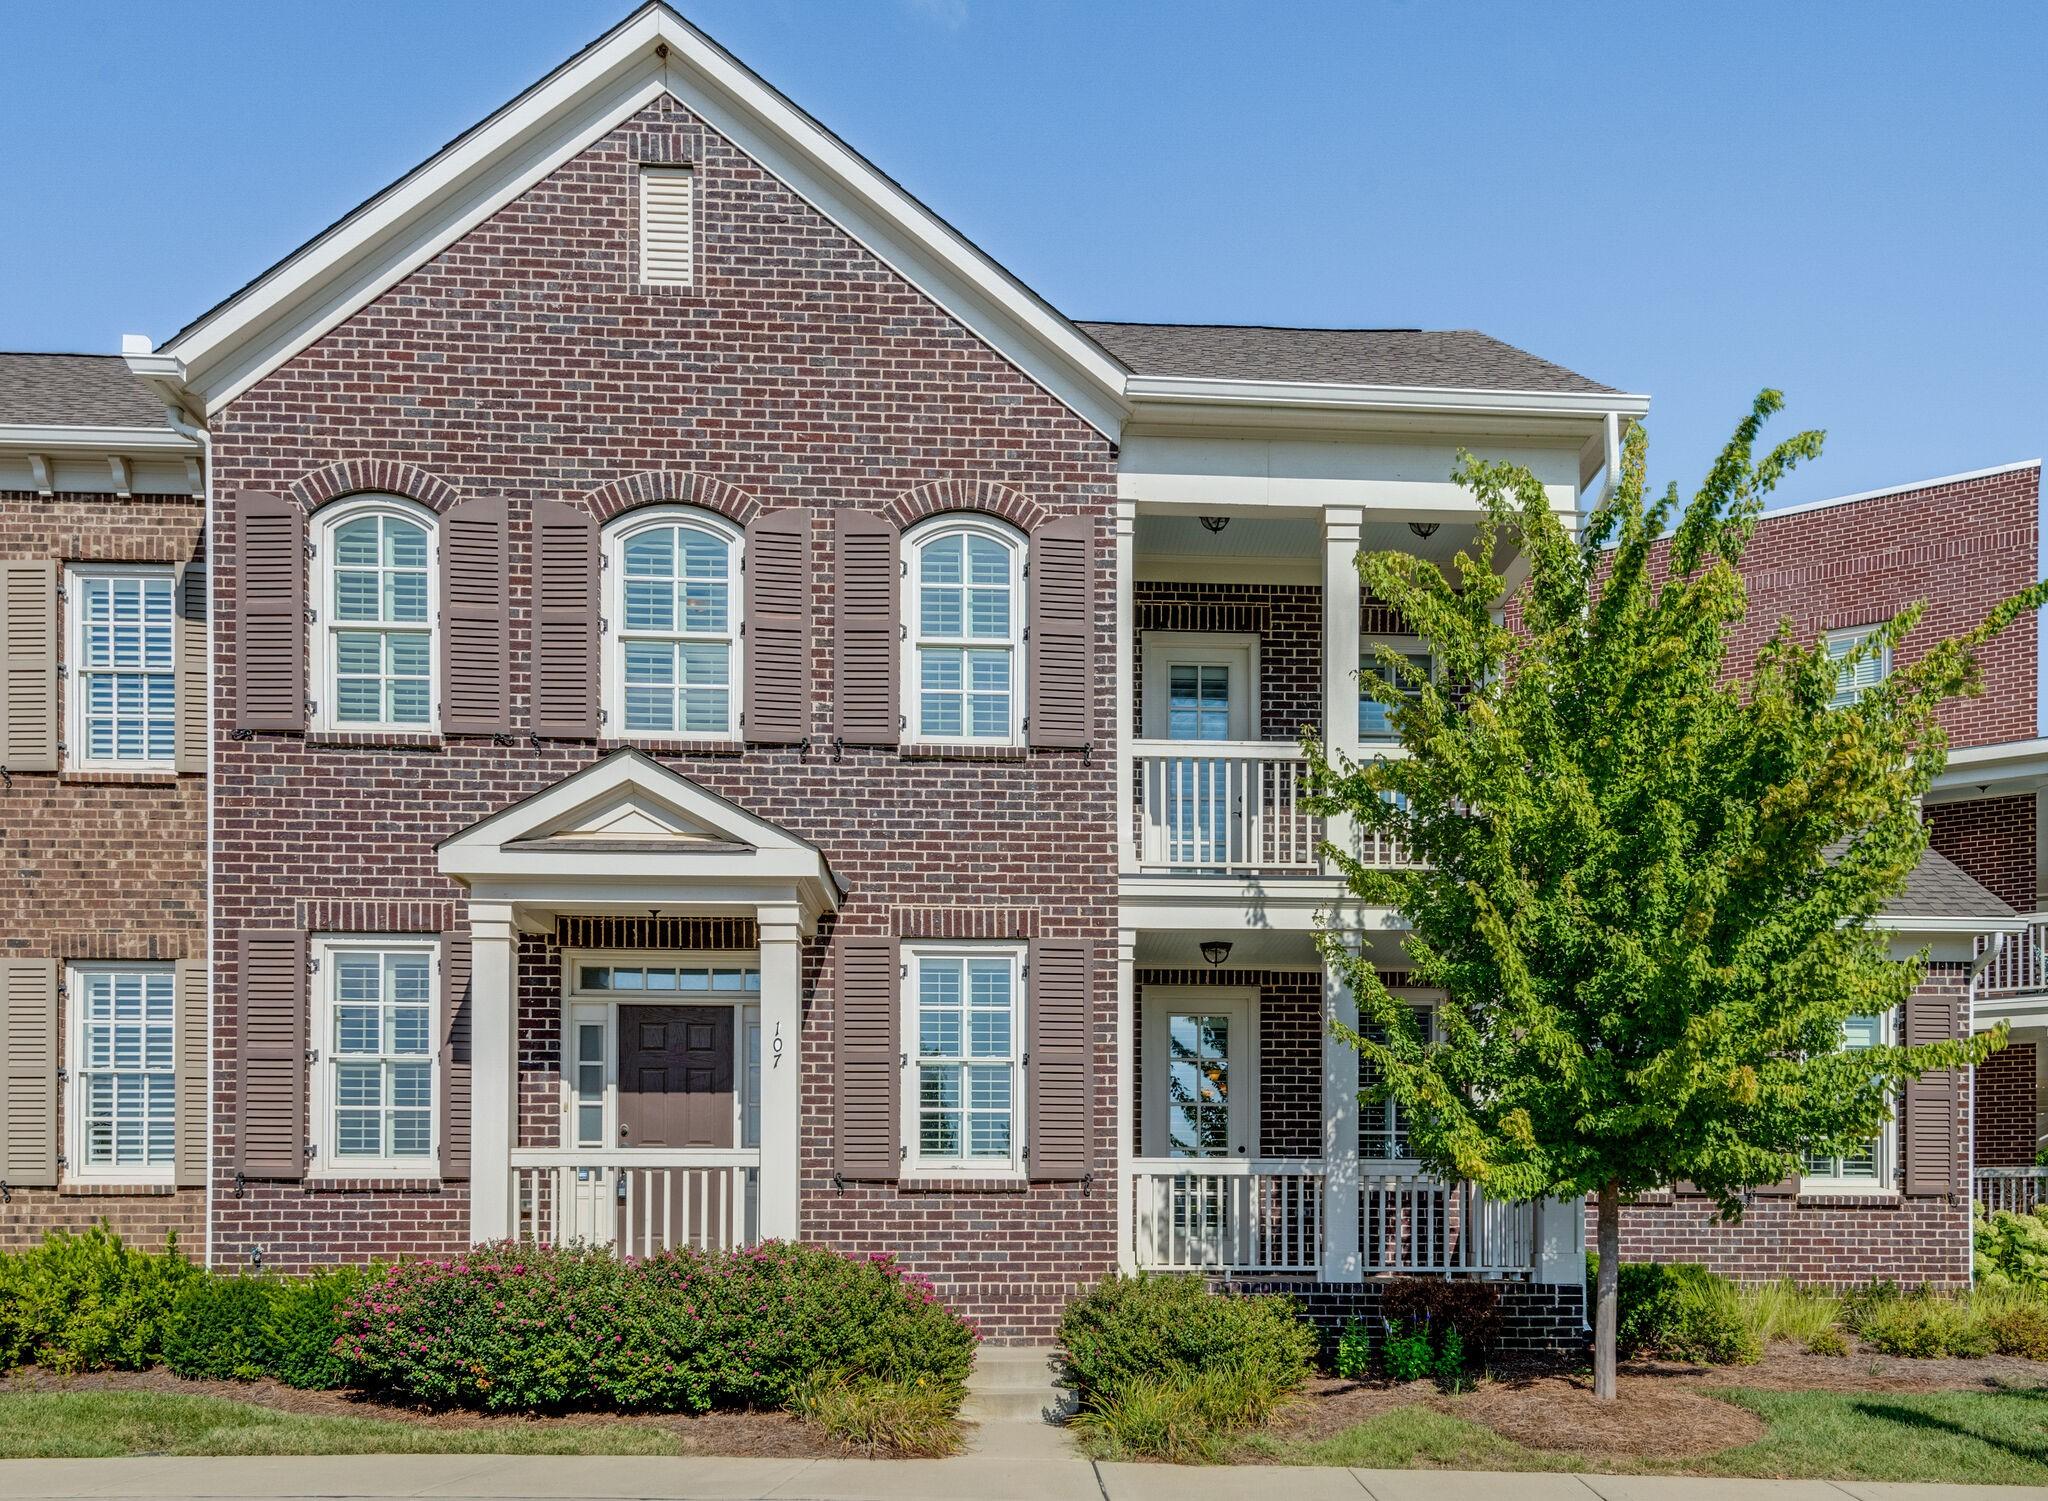 107 Swain Cir Property Photo - Franklin, TN real estate listing